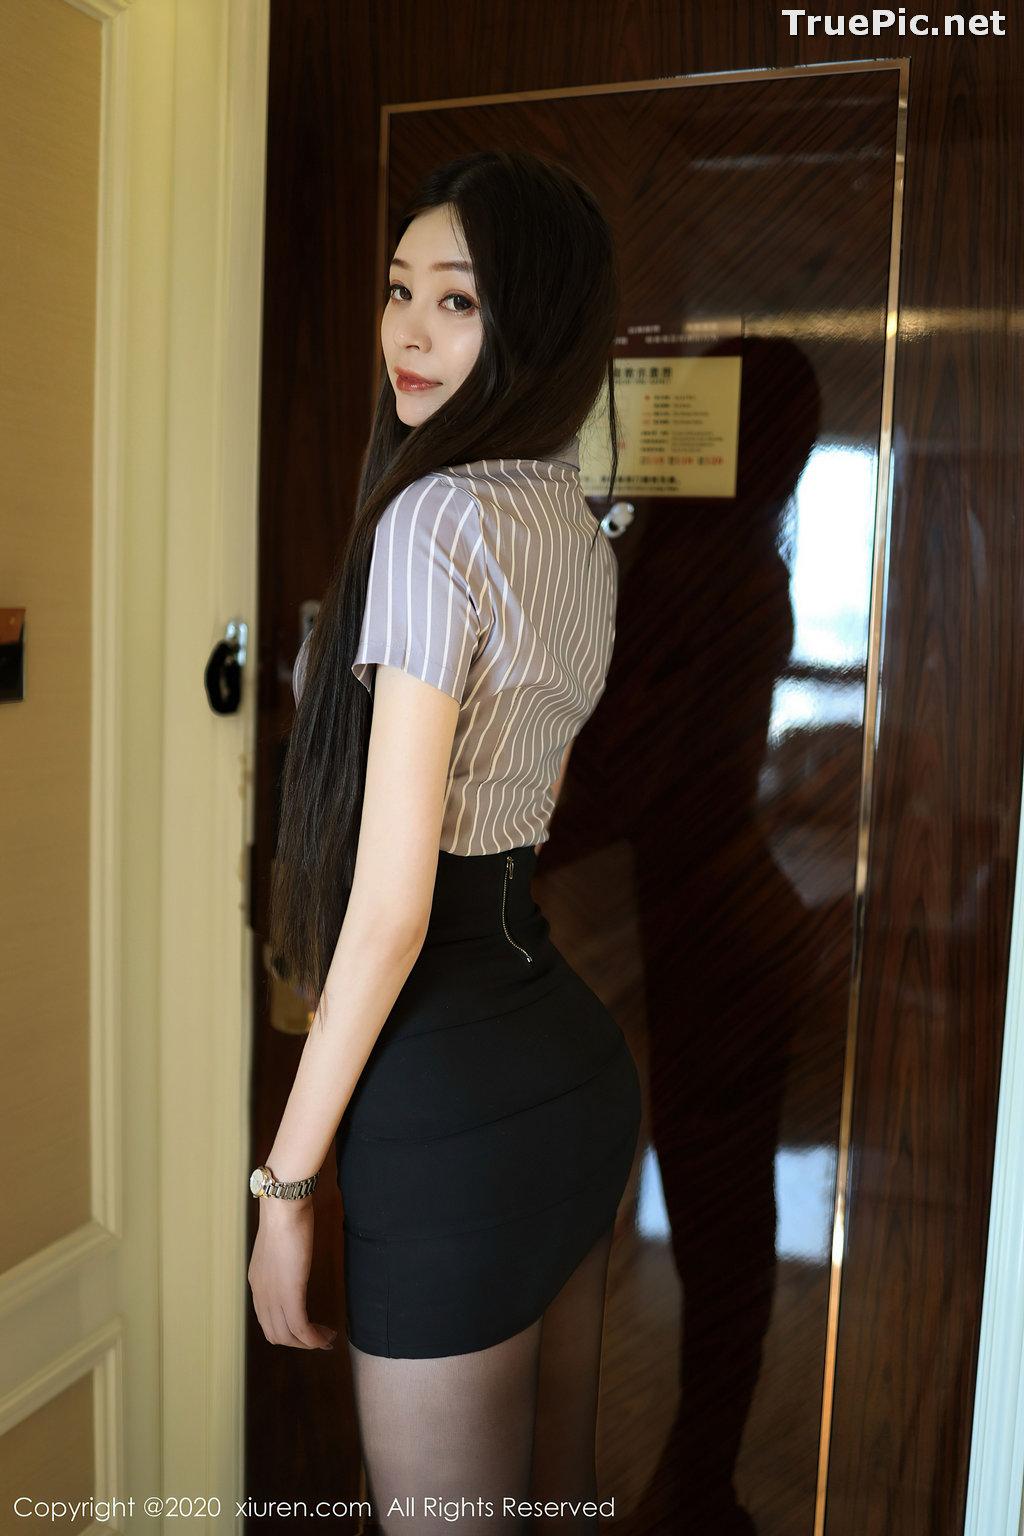 Image XIUREN No.2336 - Chinese Model - 樱花Elsa - Sexy Office Girl - TruePic.net - Picture-8